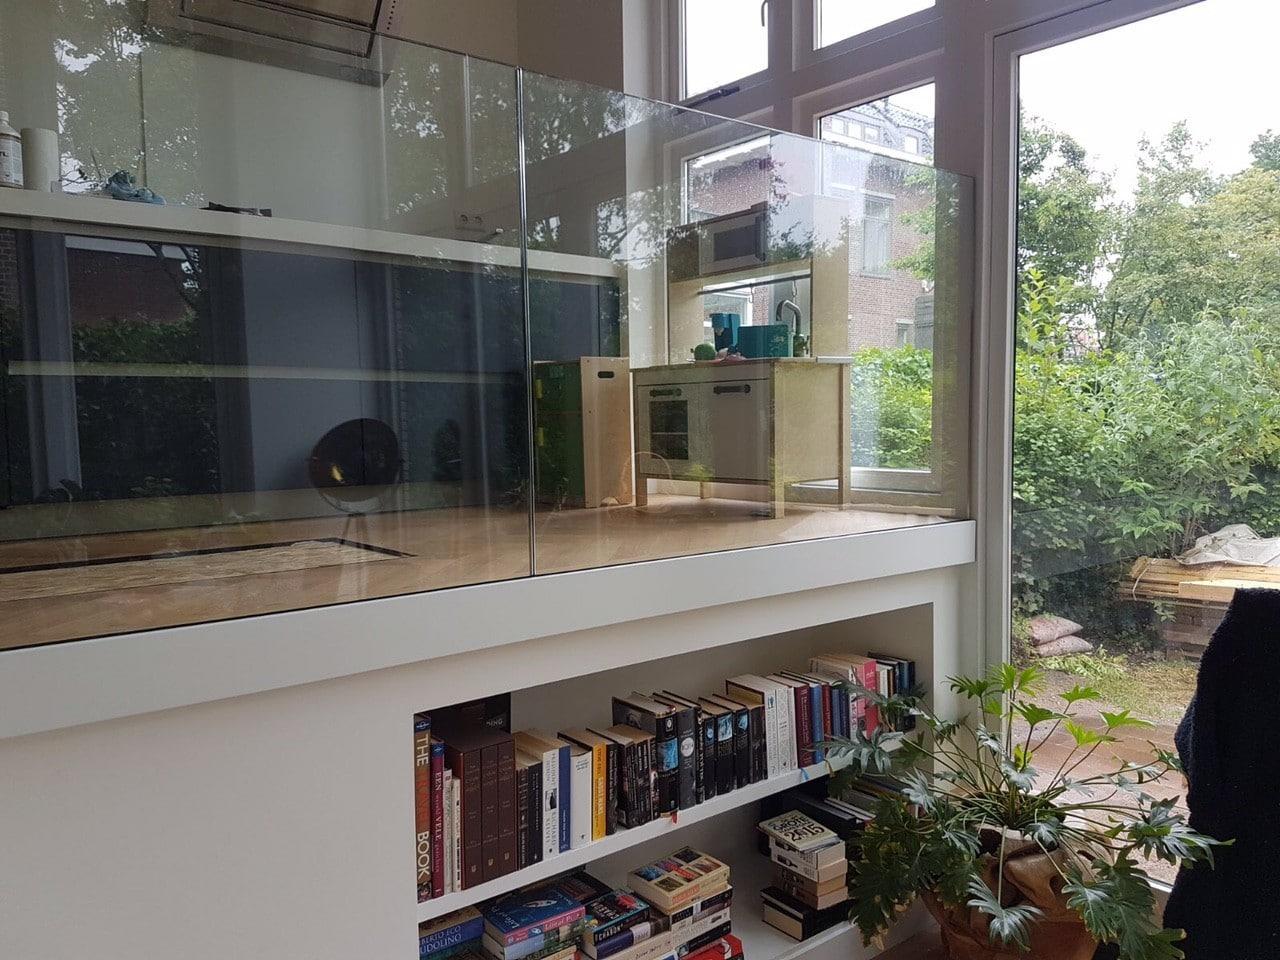 Glazen balustrade in wit vloerprofiel